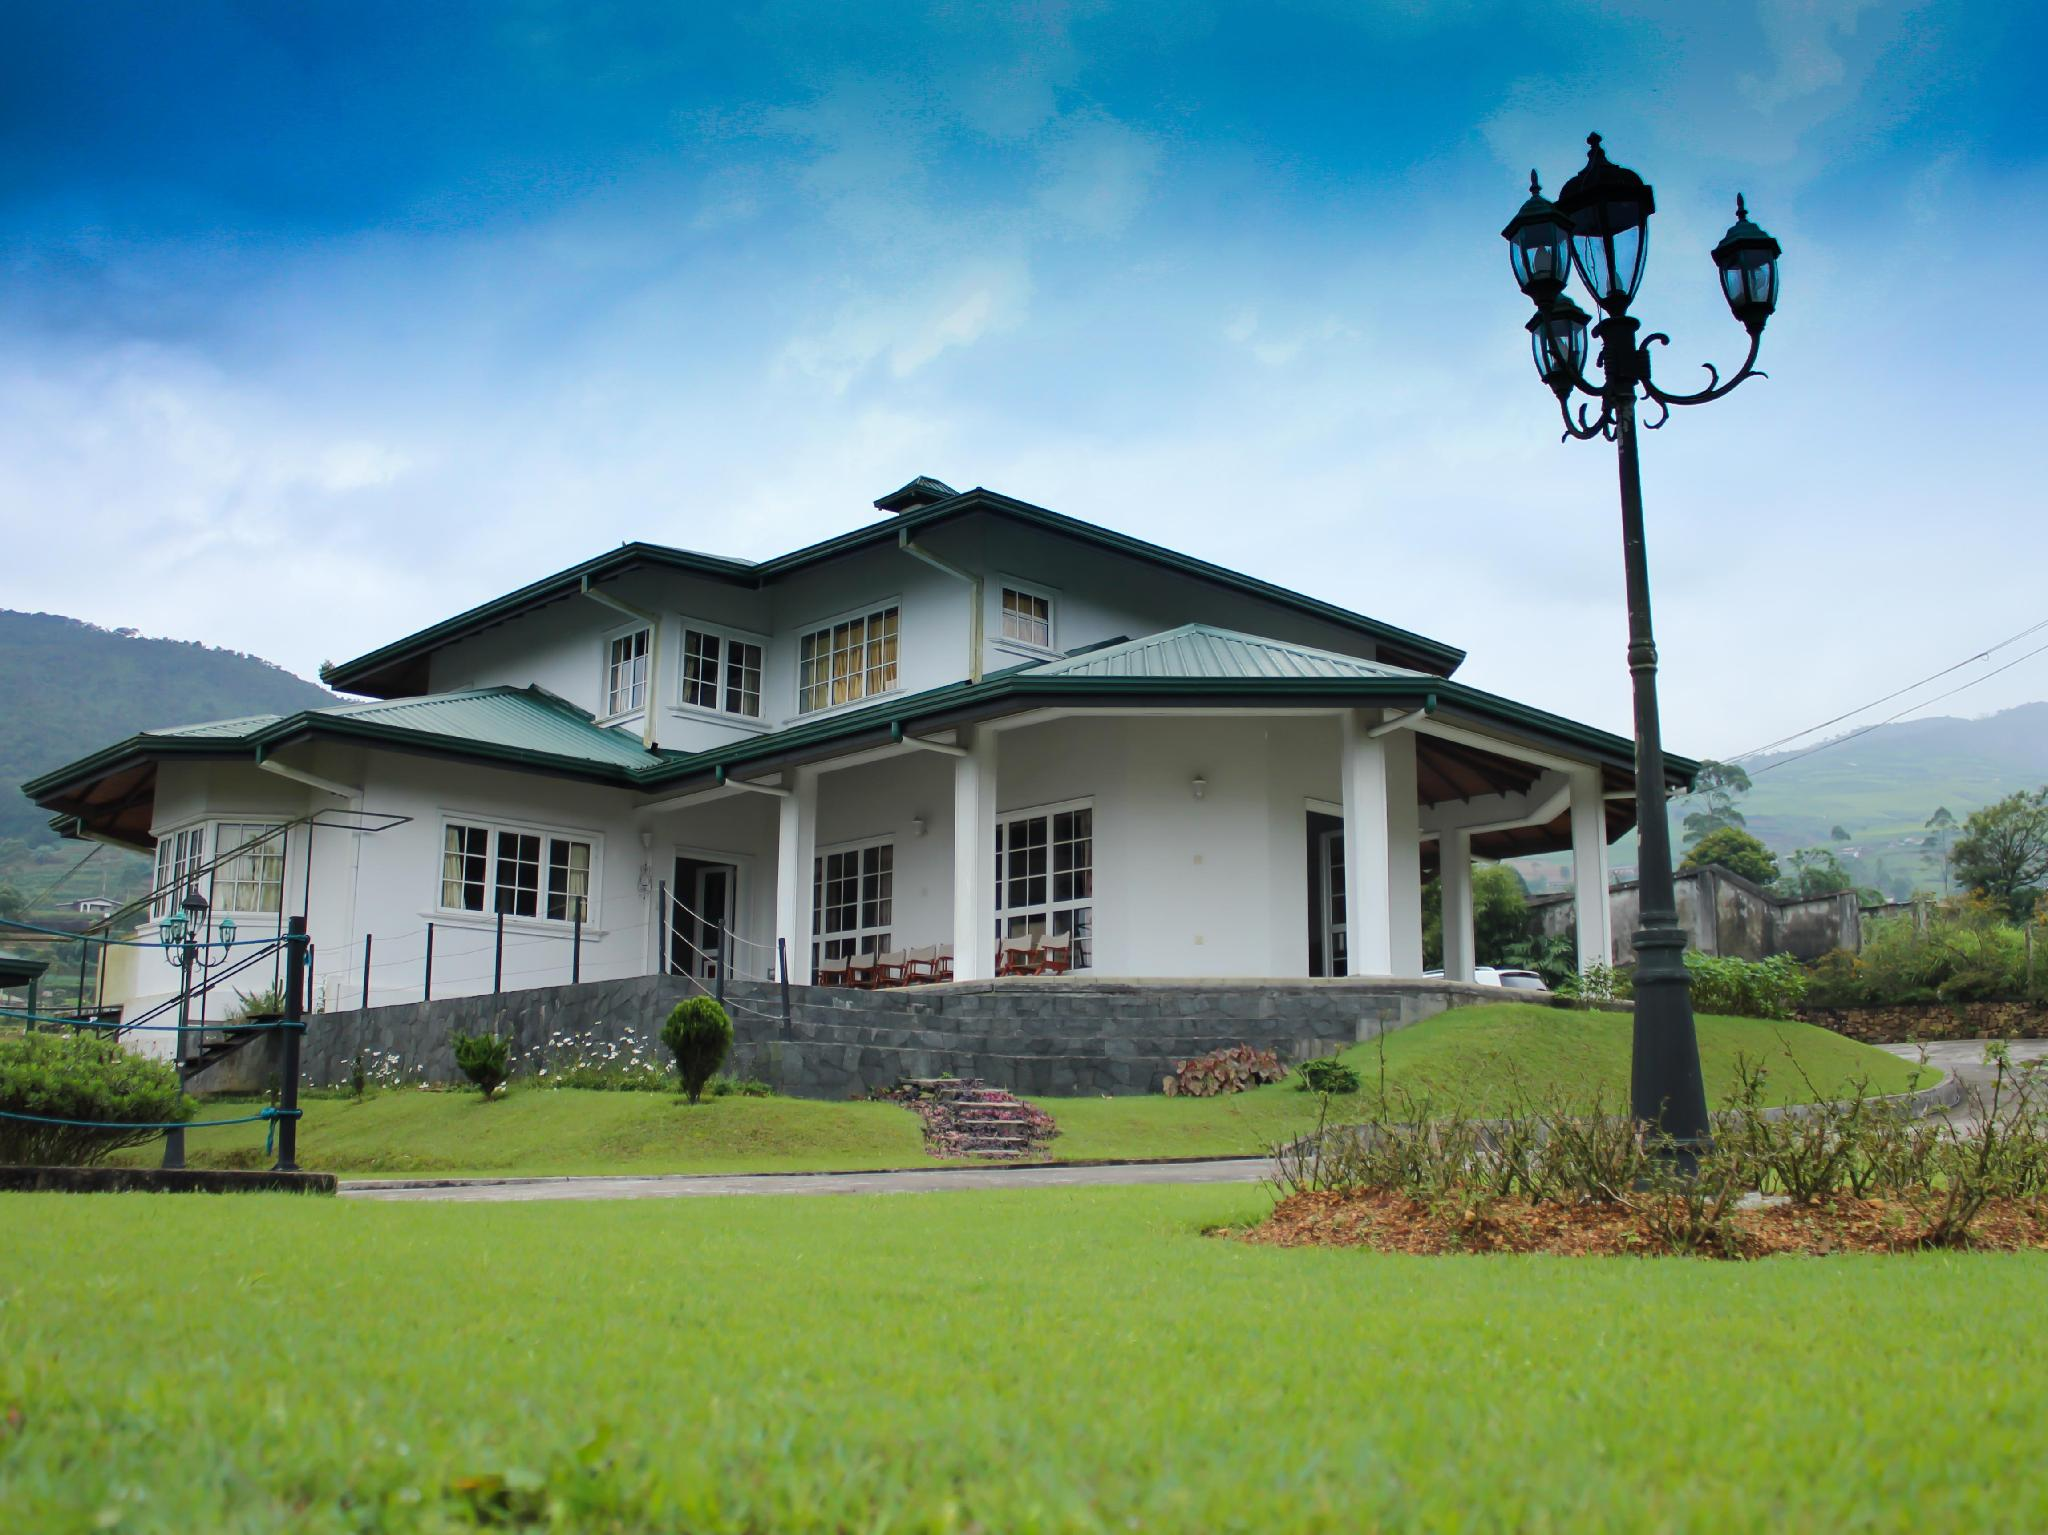 forest dale holiday bungalow nuwara eliya sri lanka great rh chiangdao com